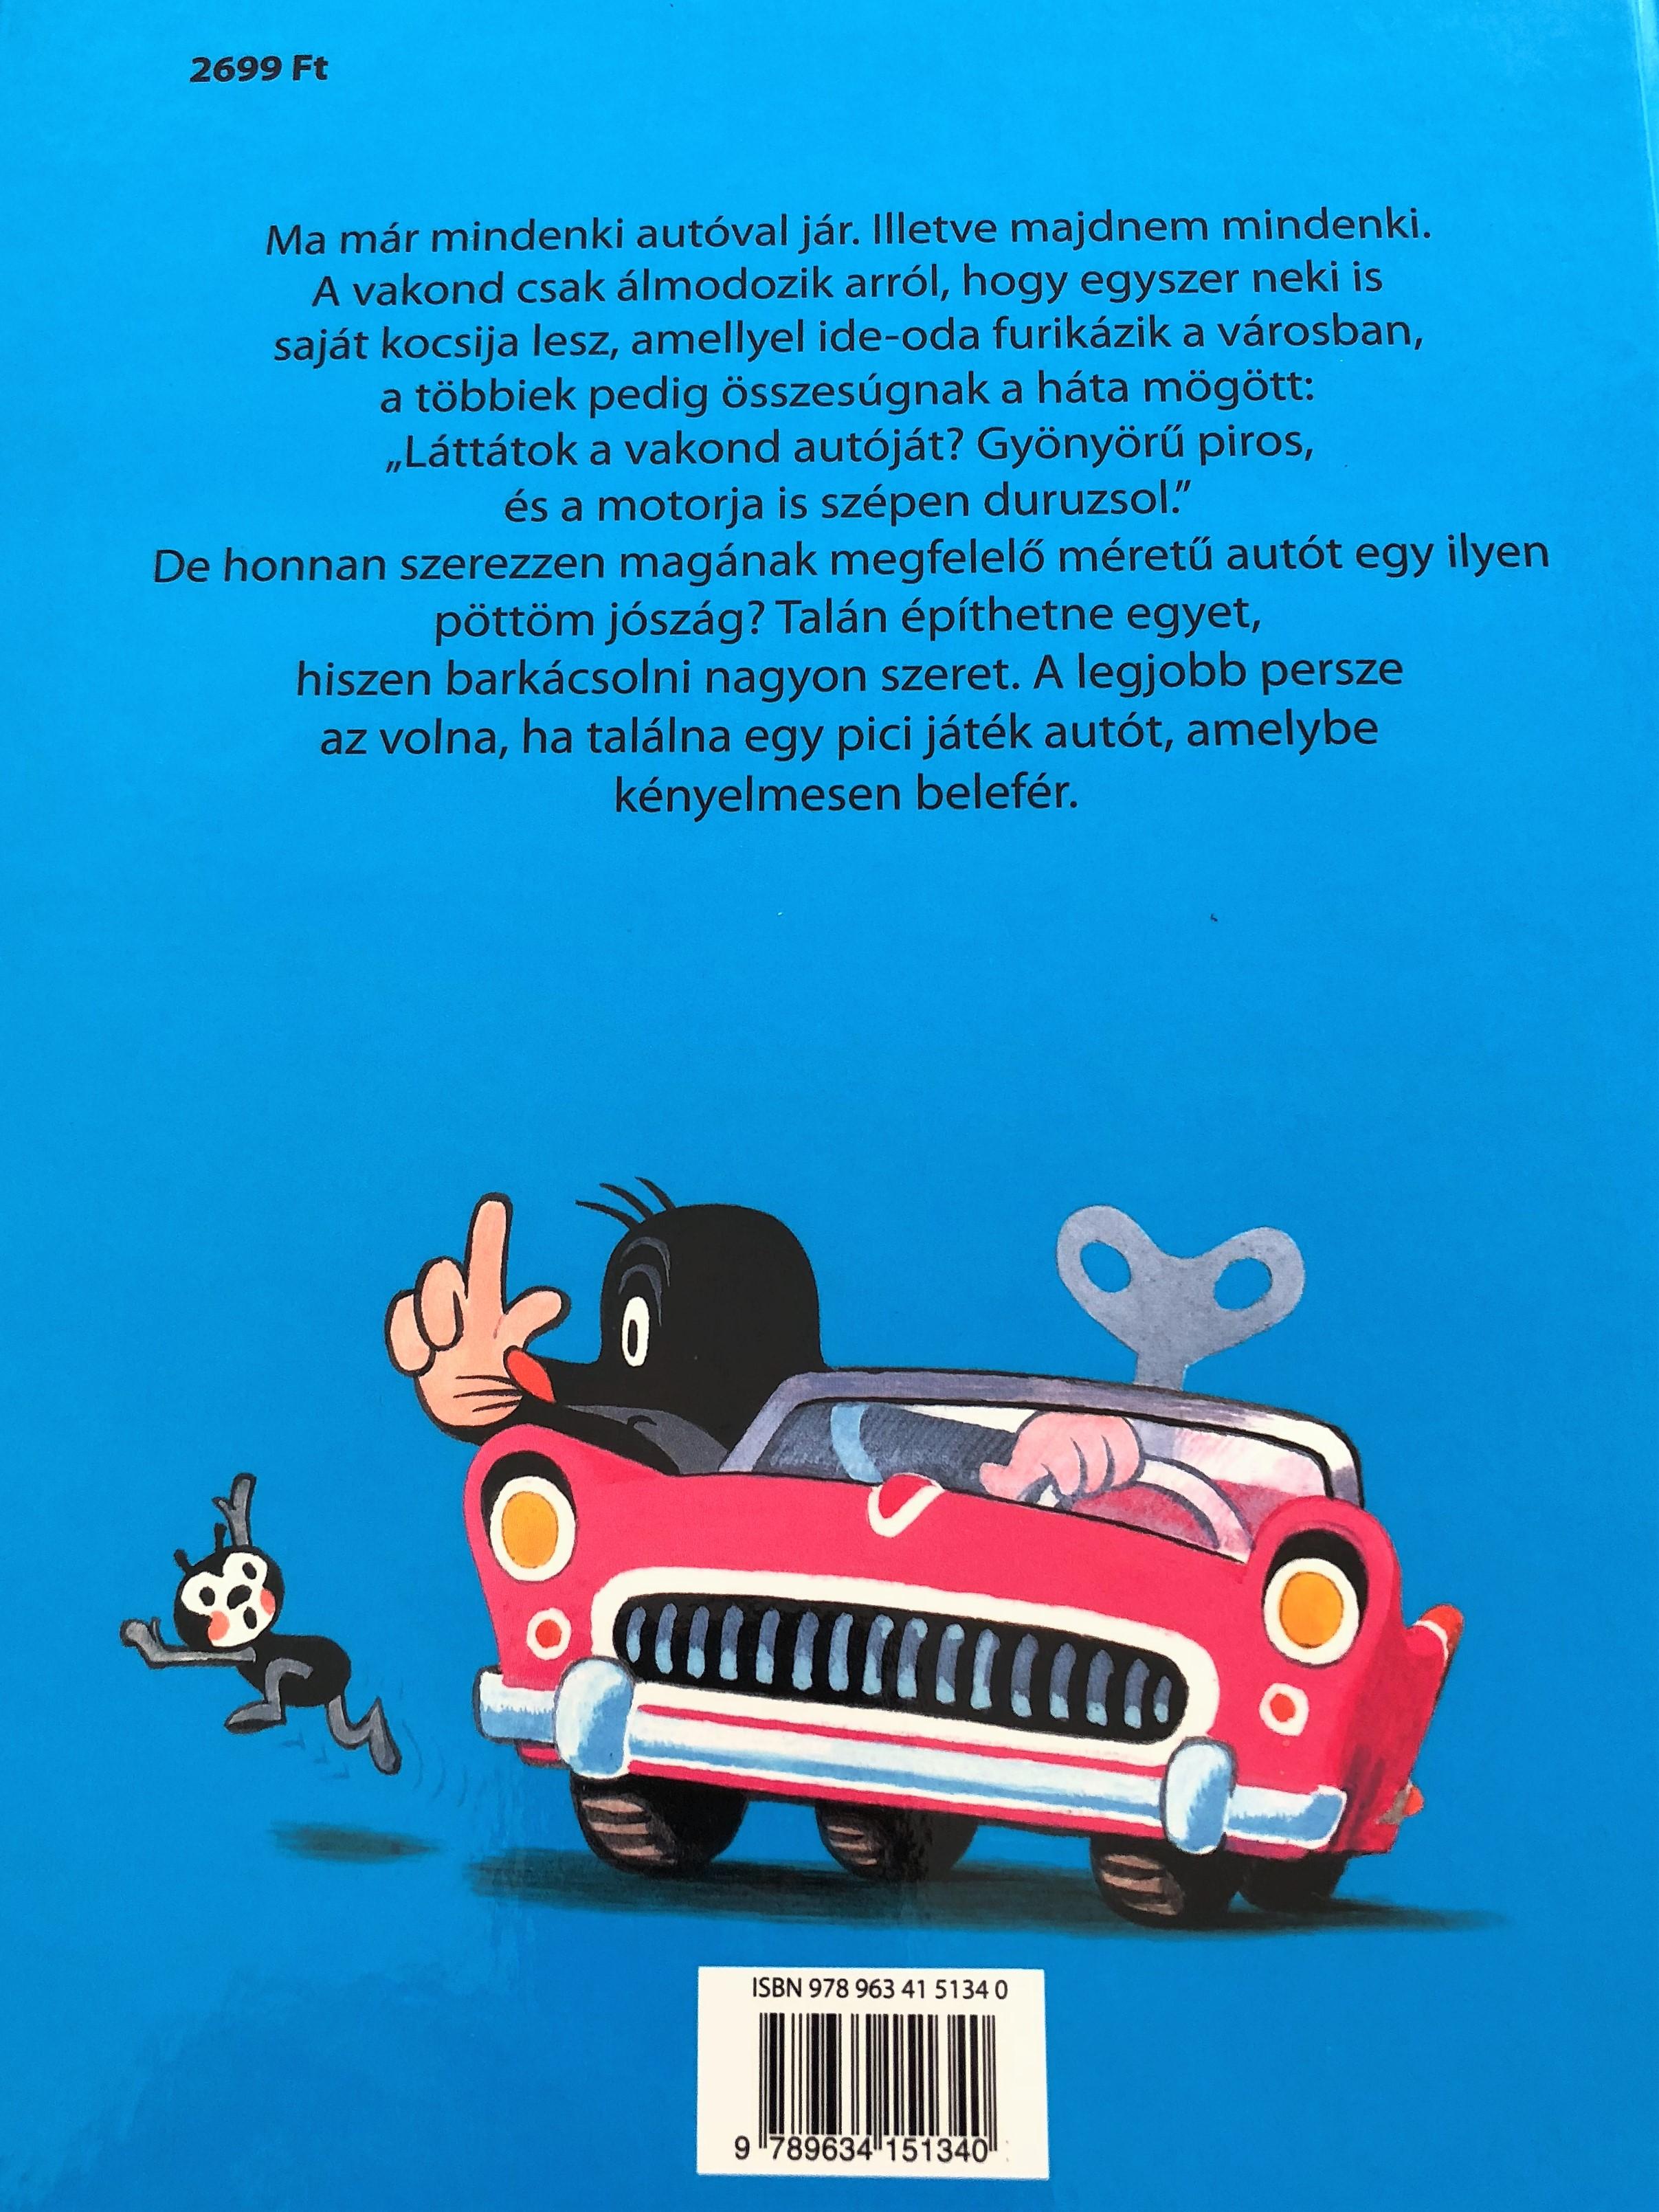 a-kisvakond-aut-ja-by-zdenek-miler-eduard-peti-ka-hungarian-translation-of-krtek-a-auti-ko-mesek-nyv-m-ra-k-nyvkiad-hardcover-13-.jpg